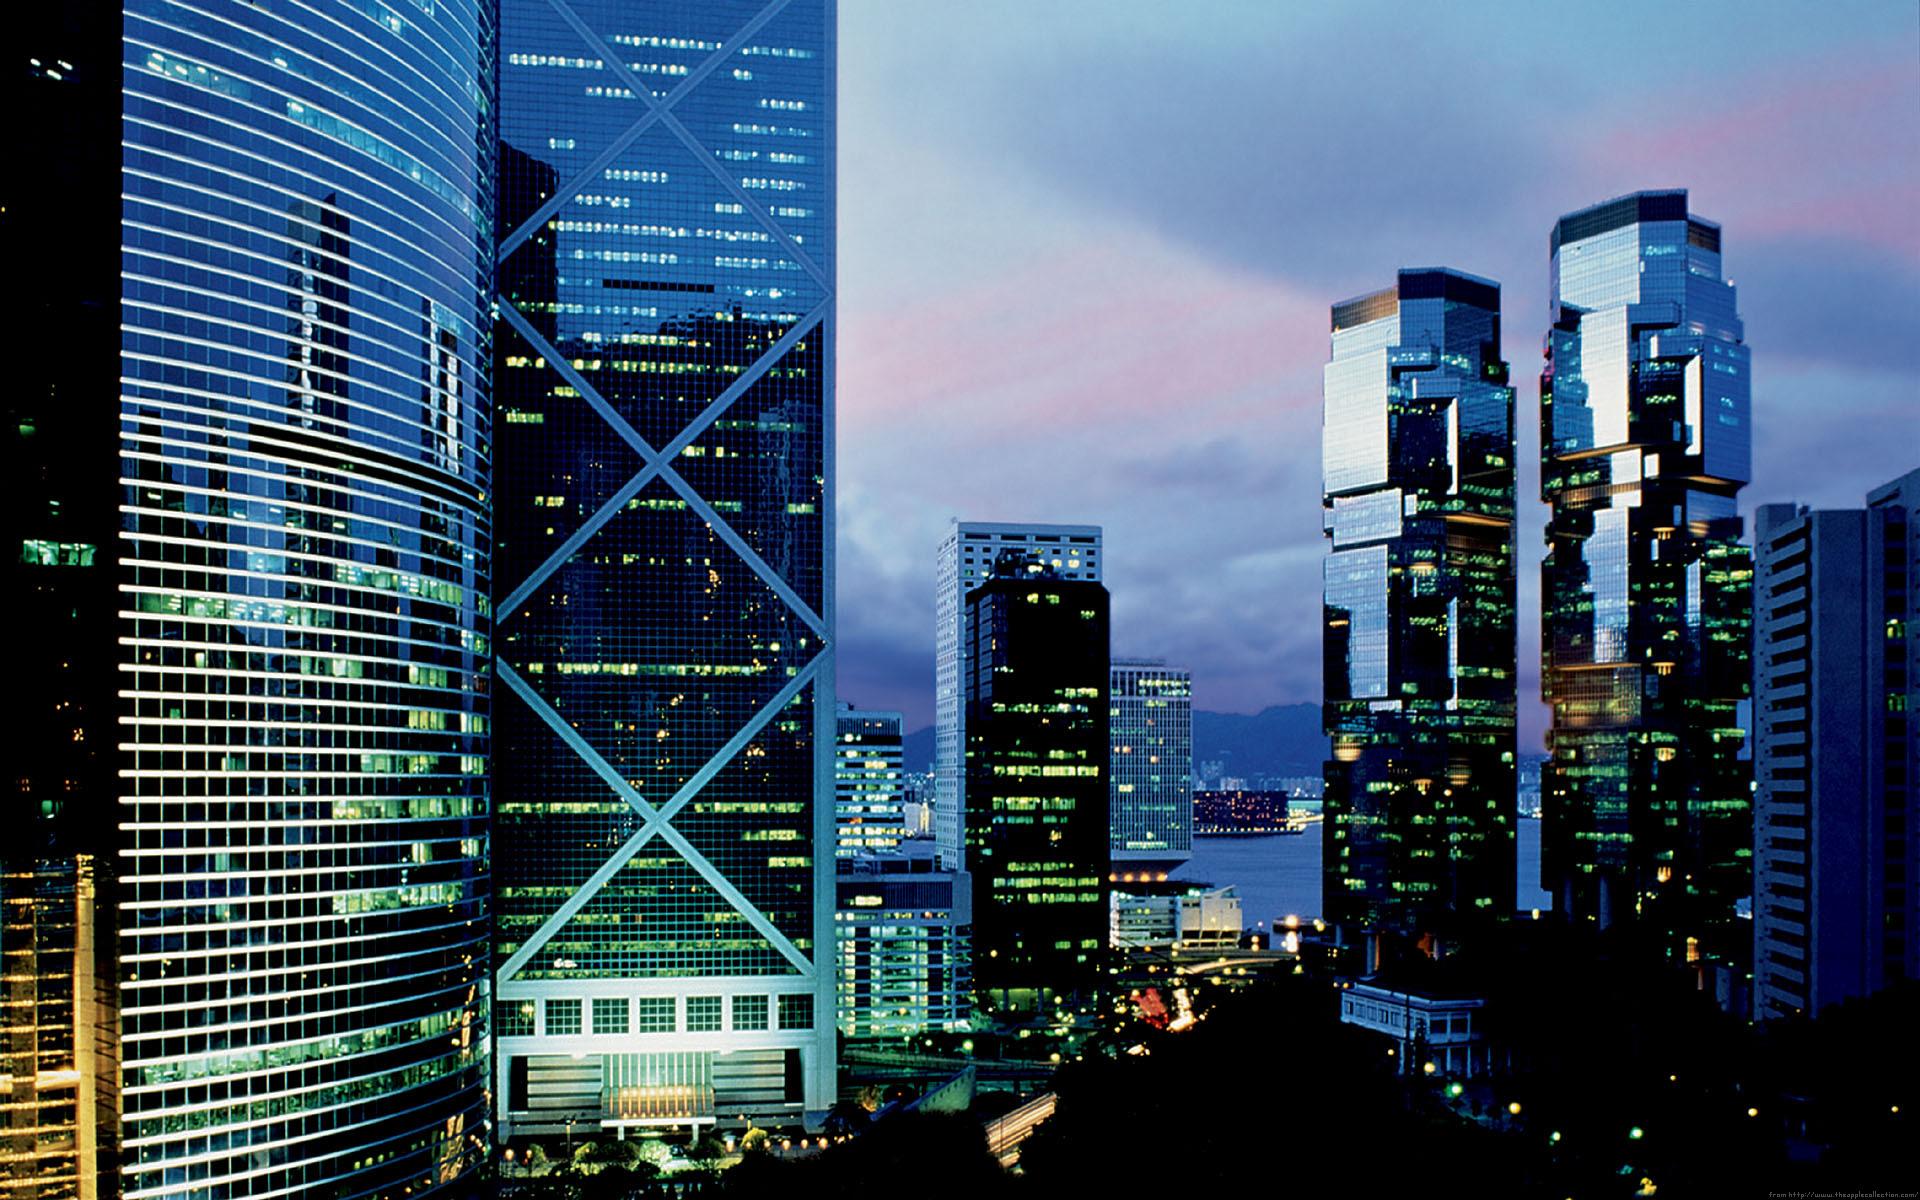 display wallpaper,metropolitan area,city,metropolis,cityscape,skyscraper